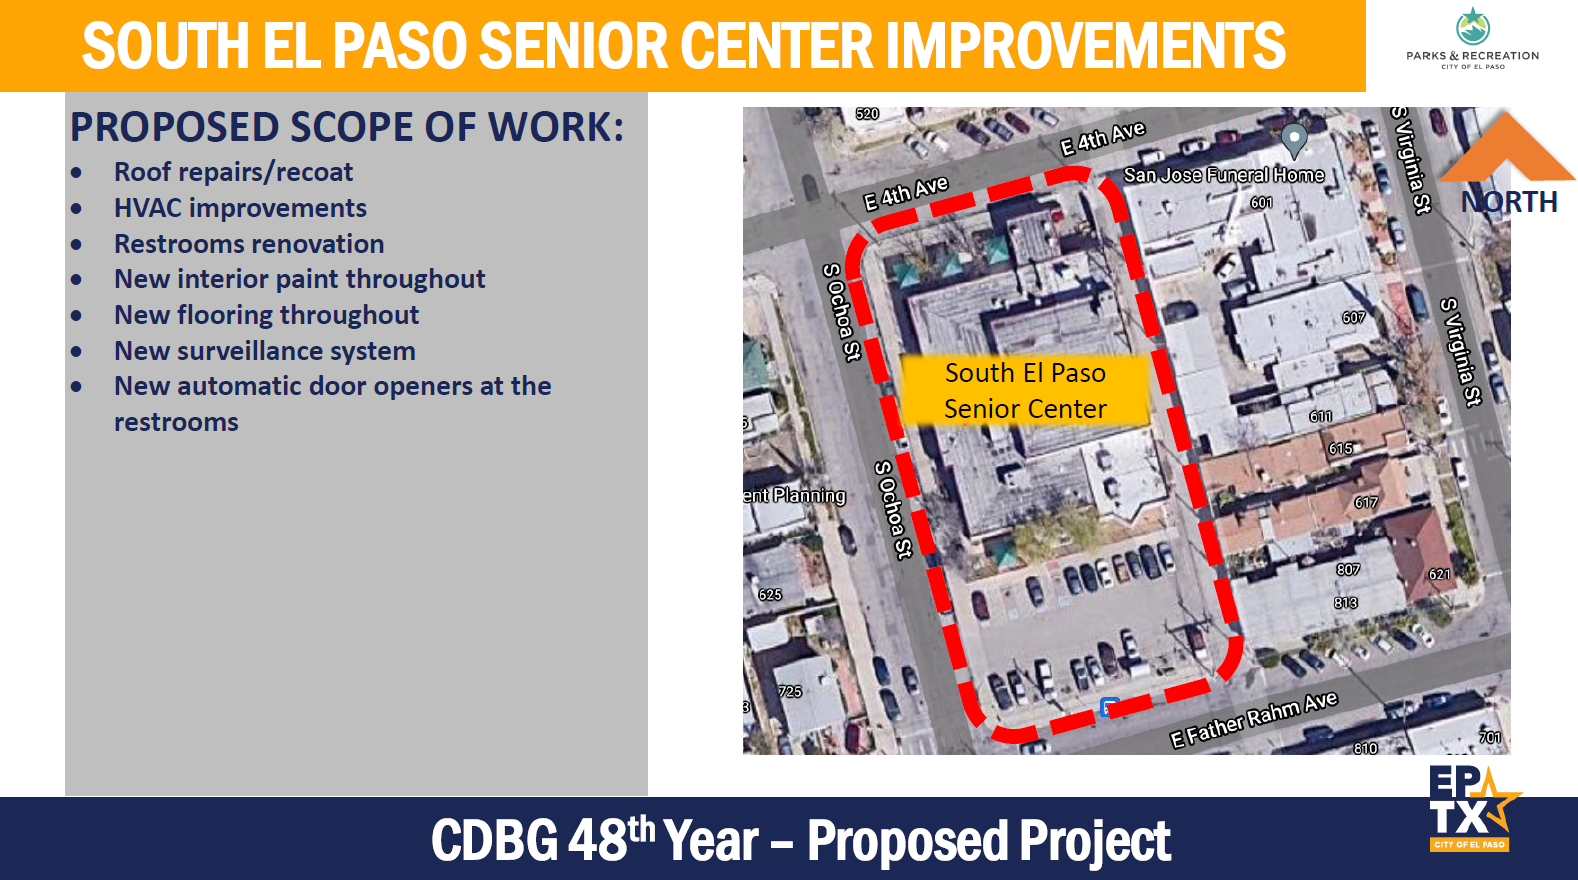 Concept -South El Paso Senior Center Improvements